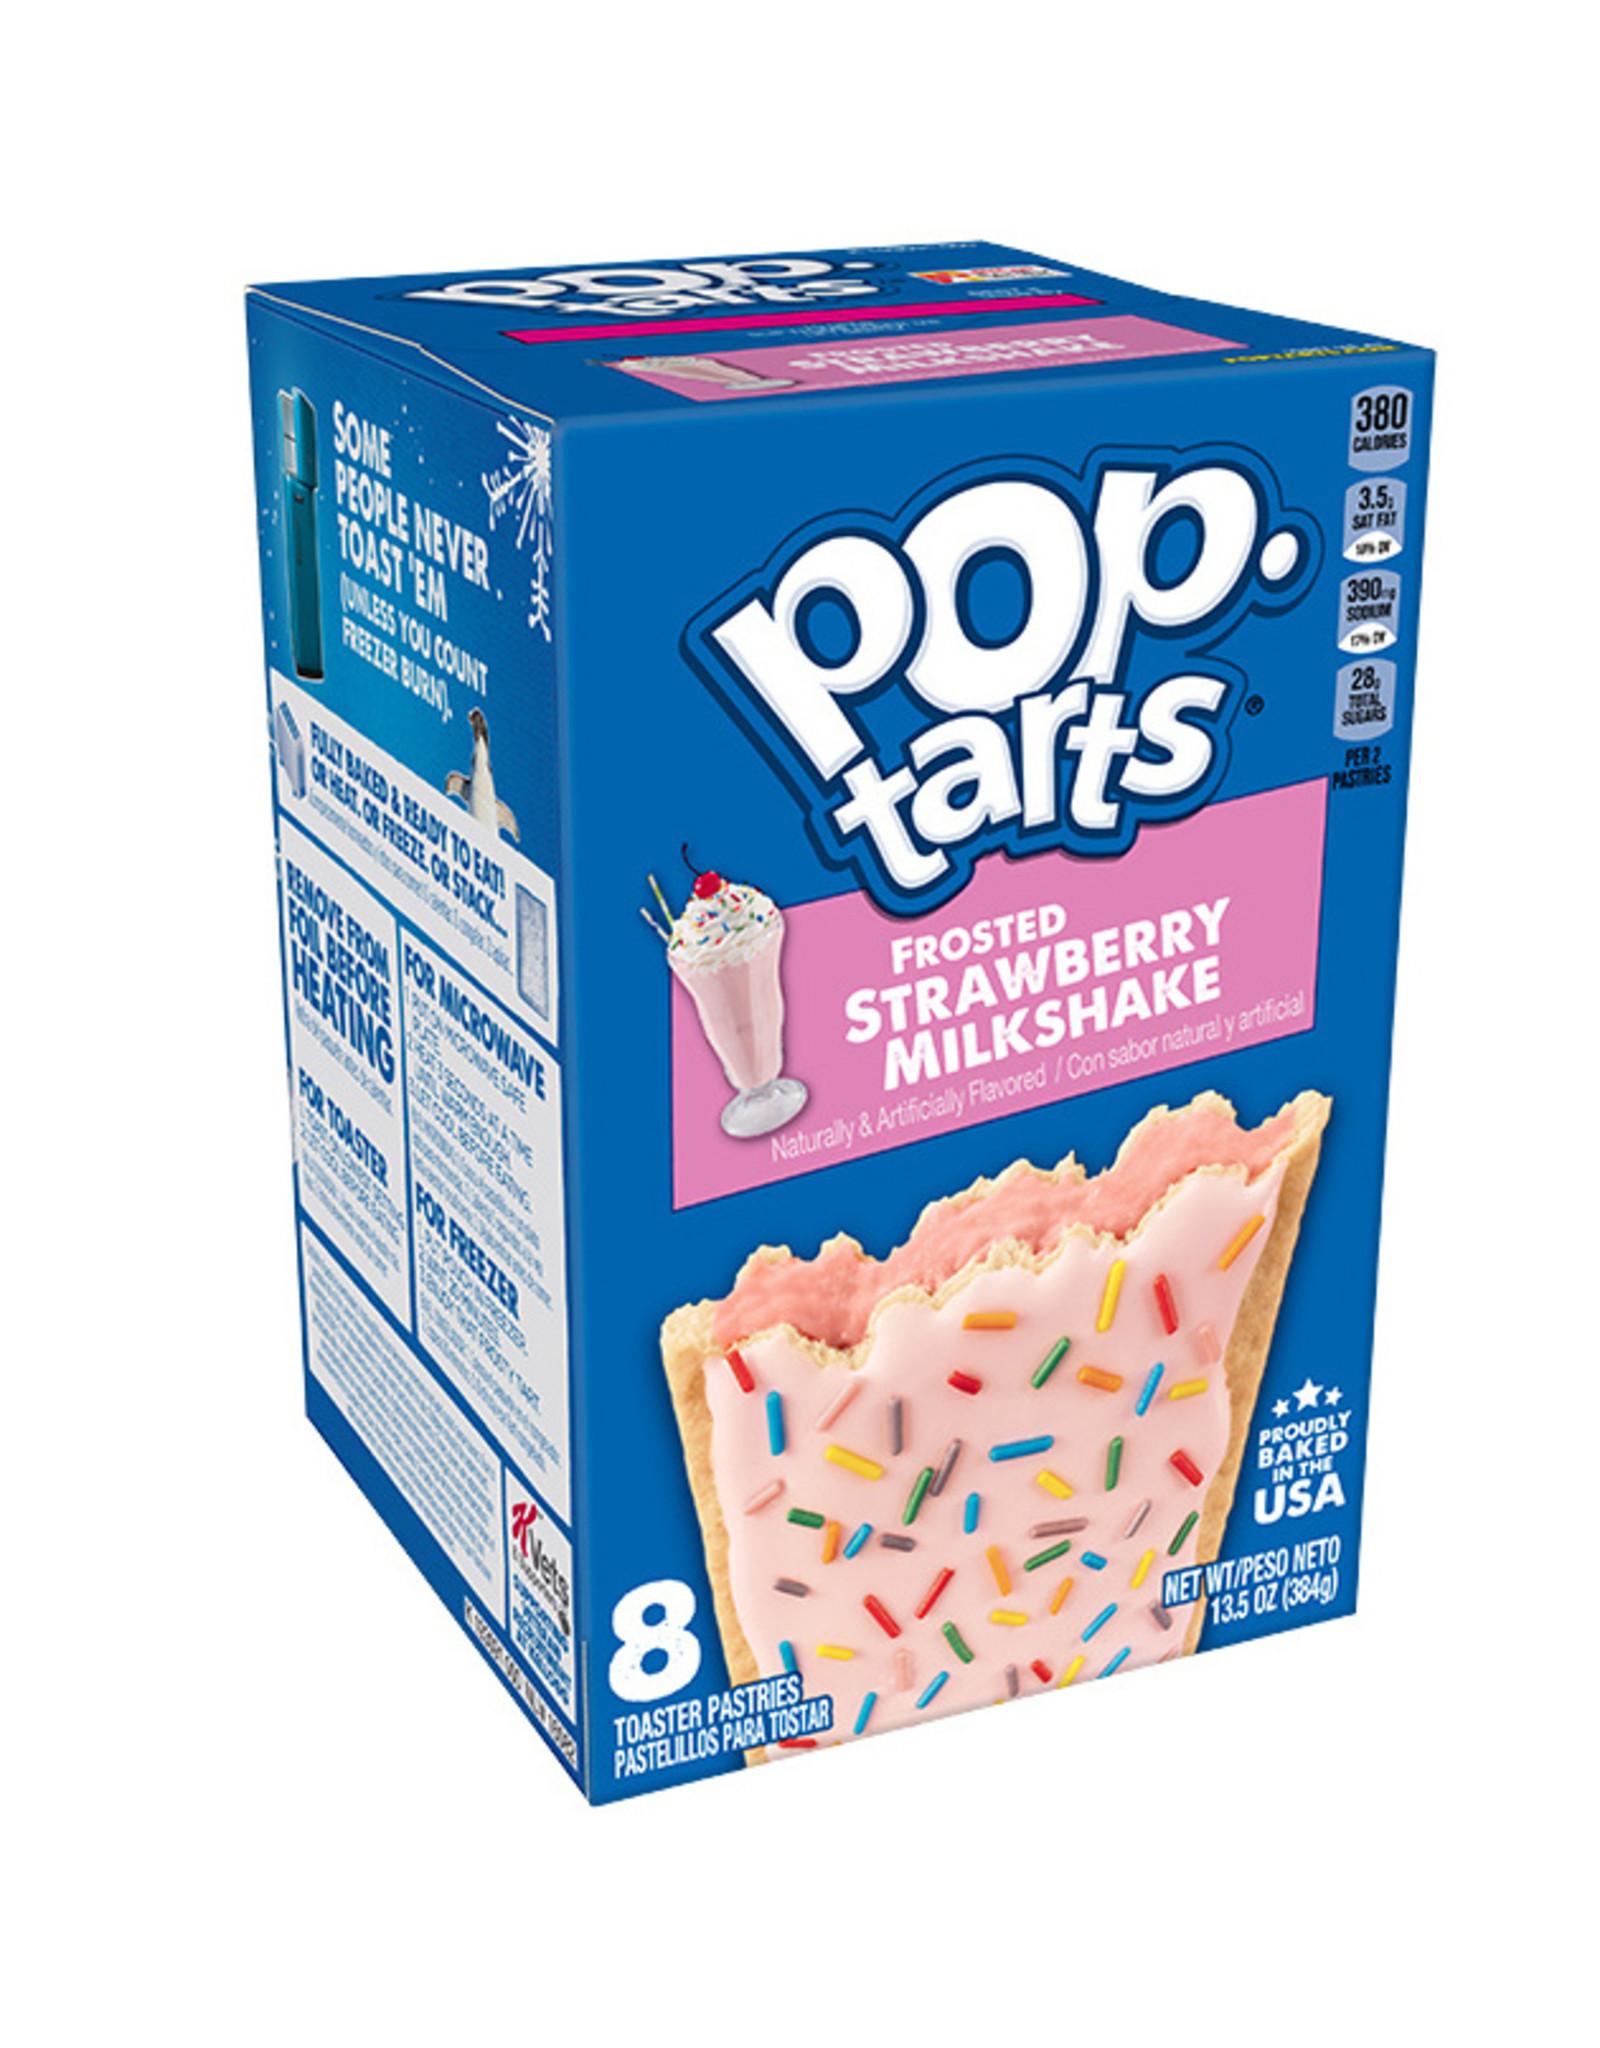 Pop-Tarts Frosted Strawberry Milkshake - 8 Pack - 384g